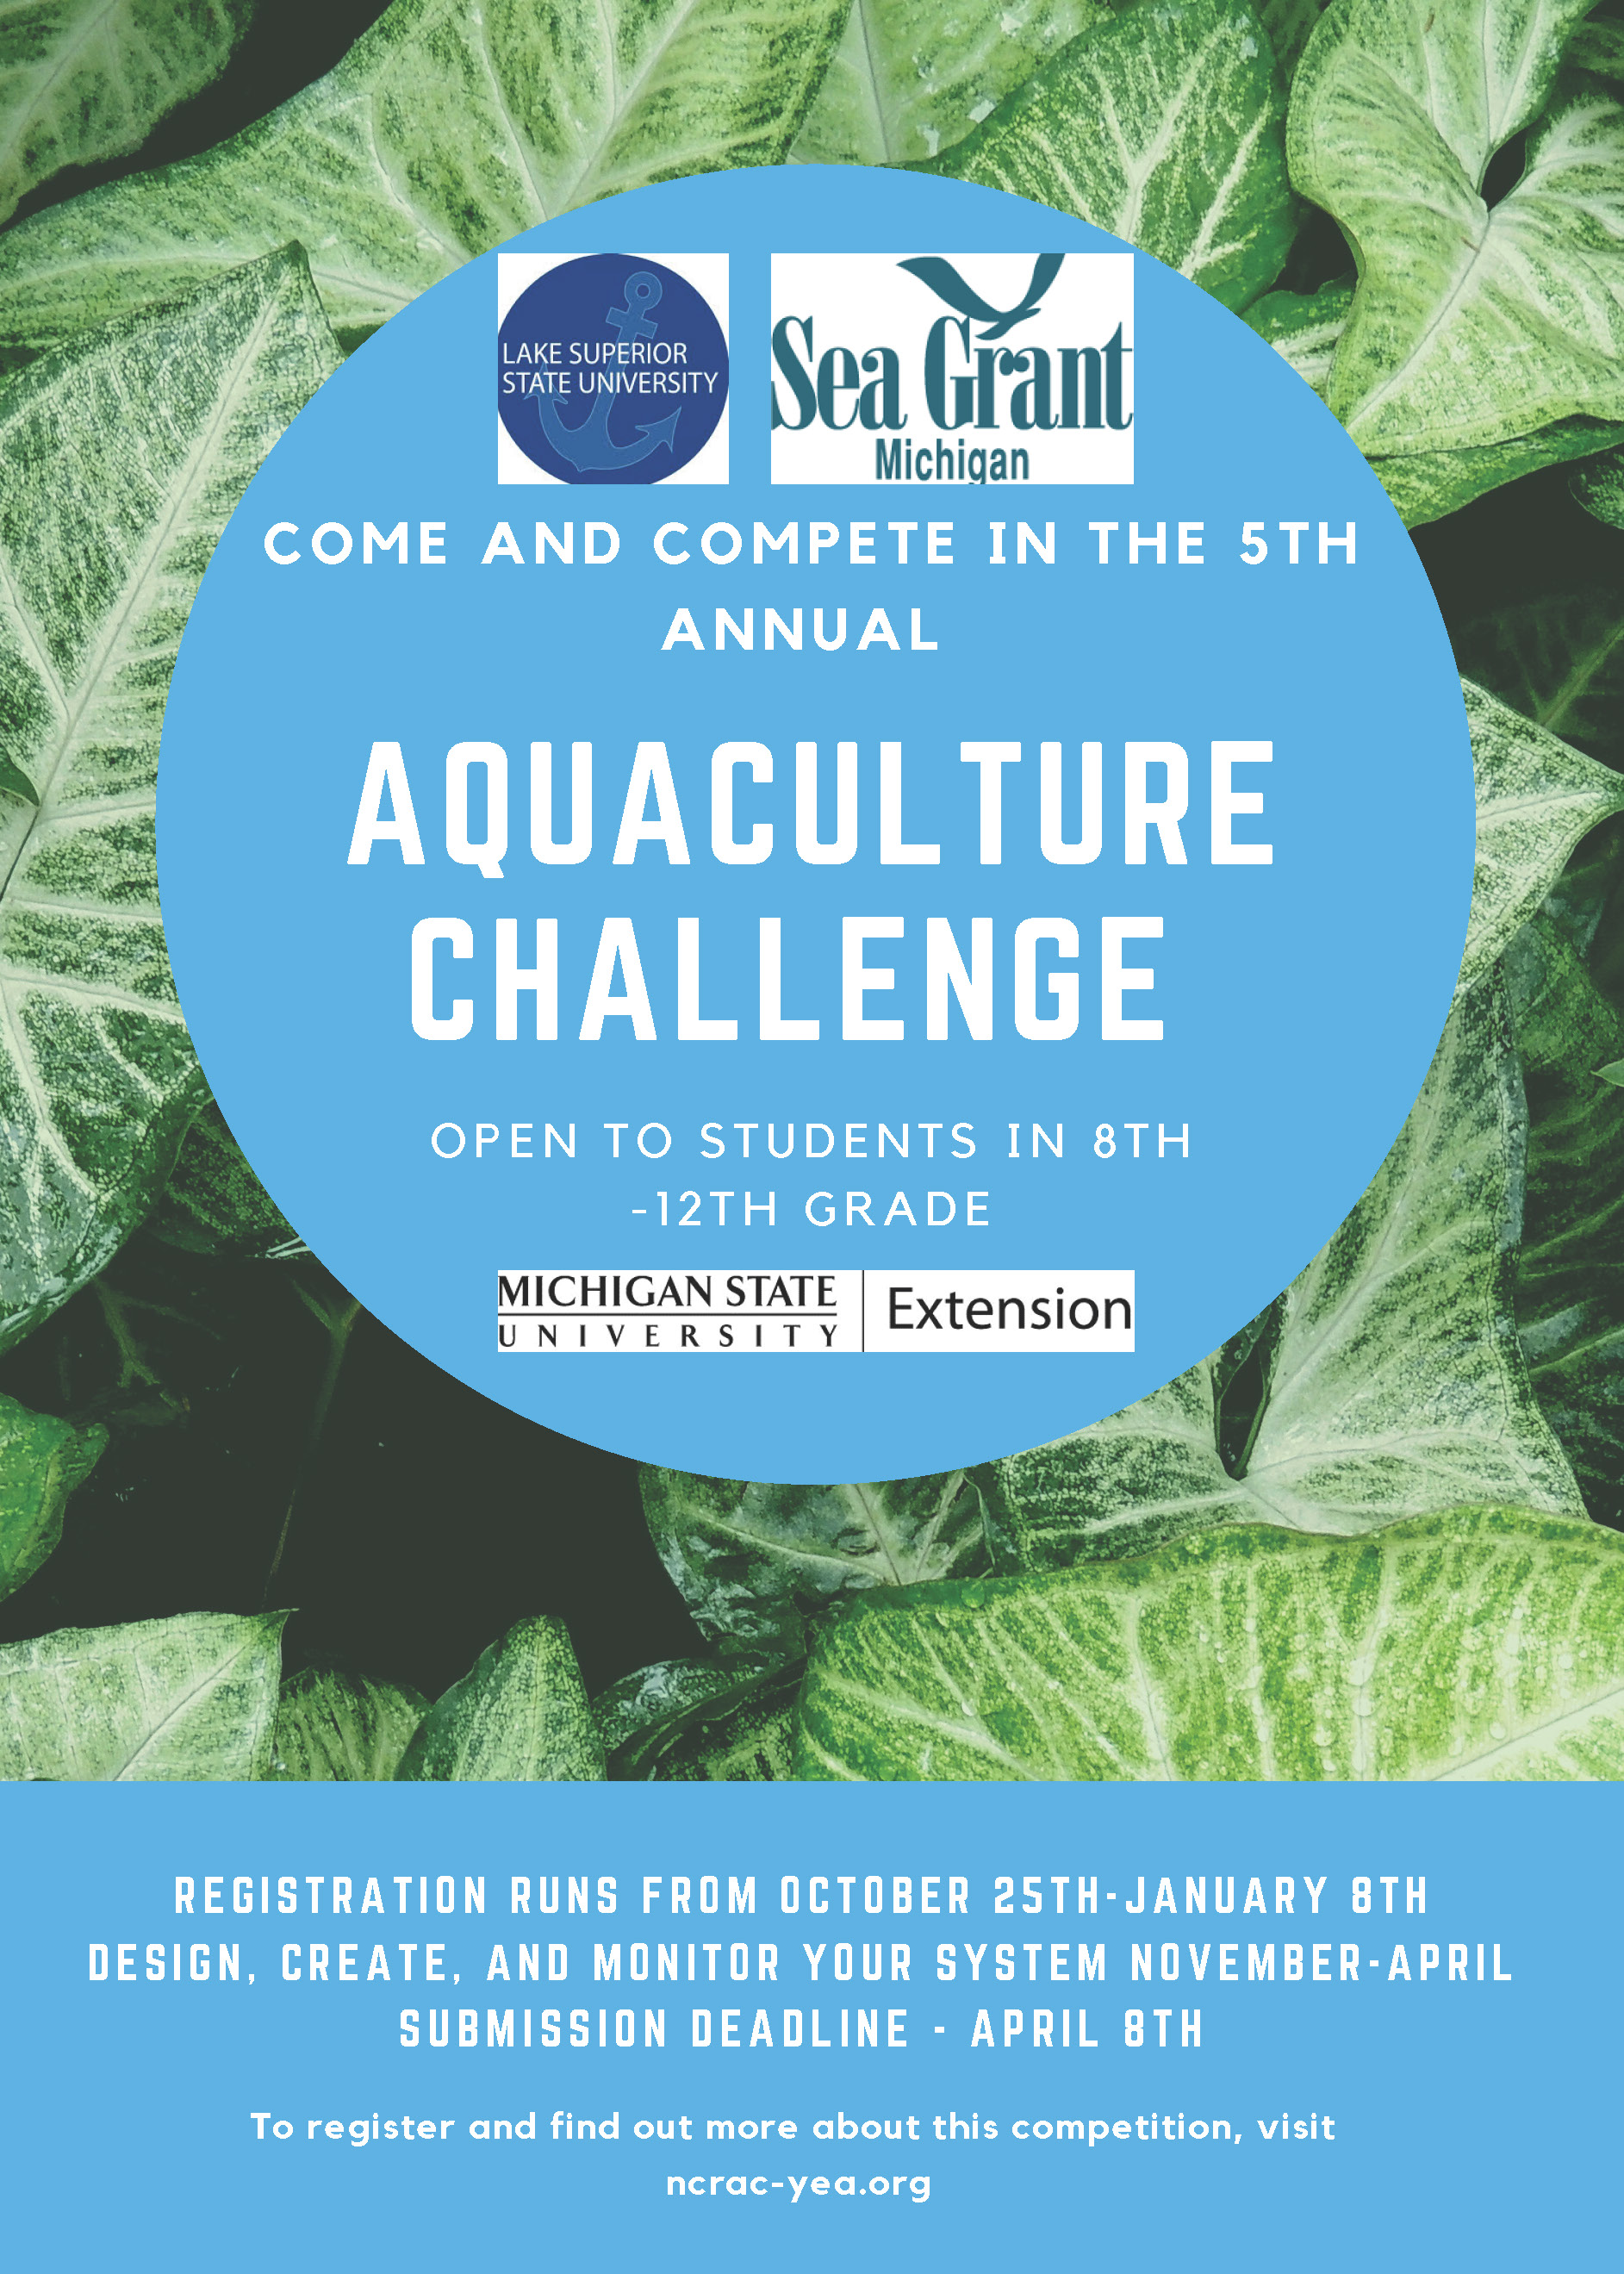 aquaculture challenge flyer